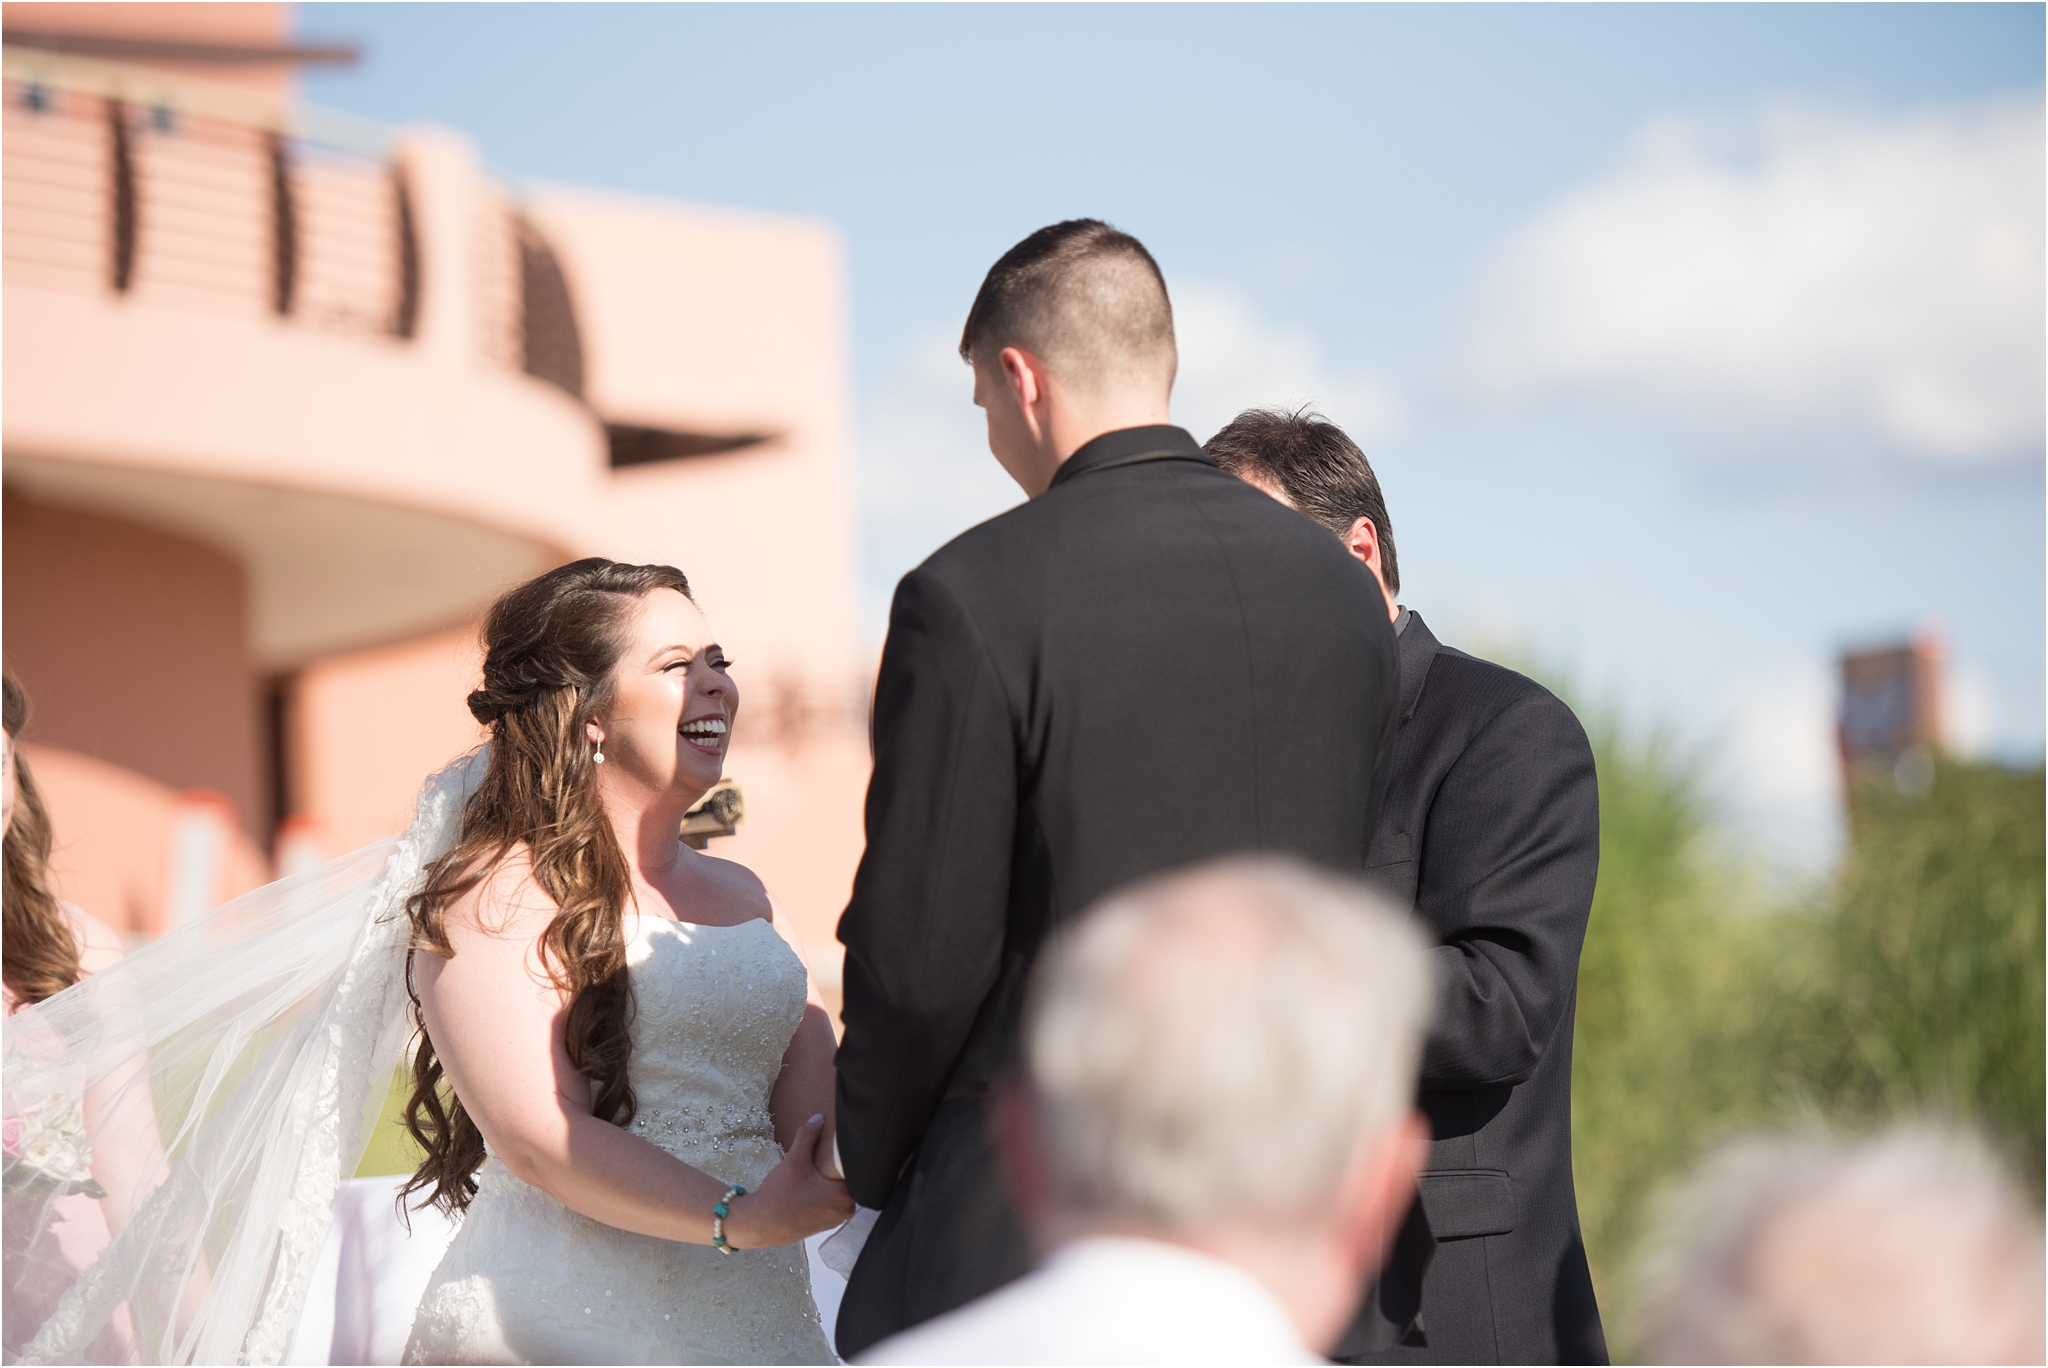 kayla kitts photography - isleta casino wedding - albuquerque wedding photographer - new mexico wedding photographer - de novo pastoral_0024.jpg